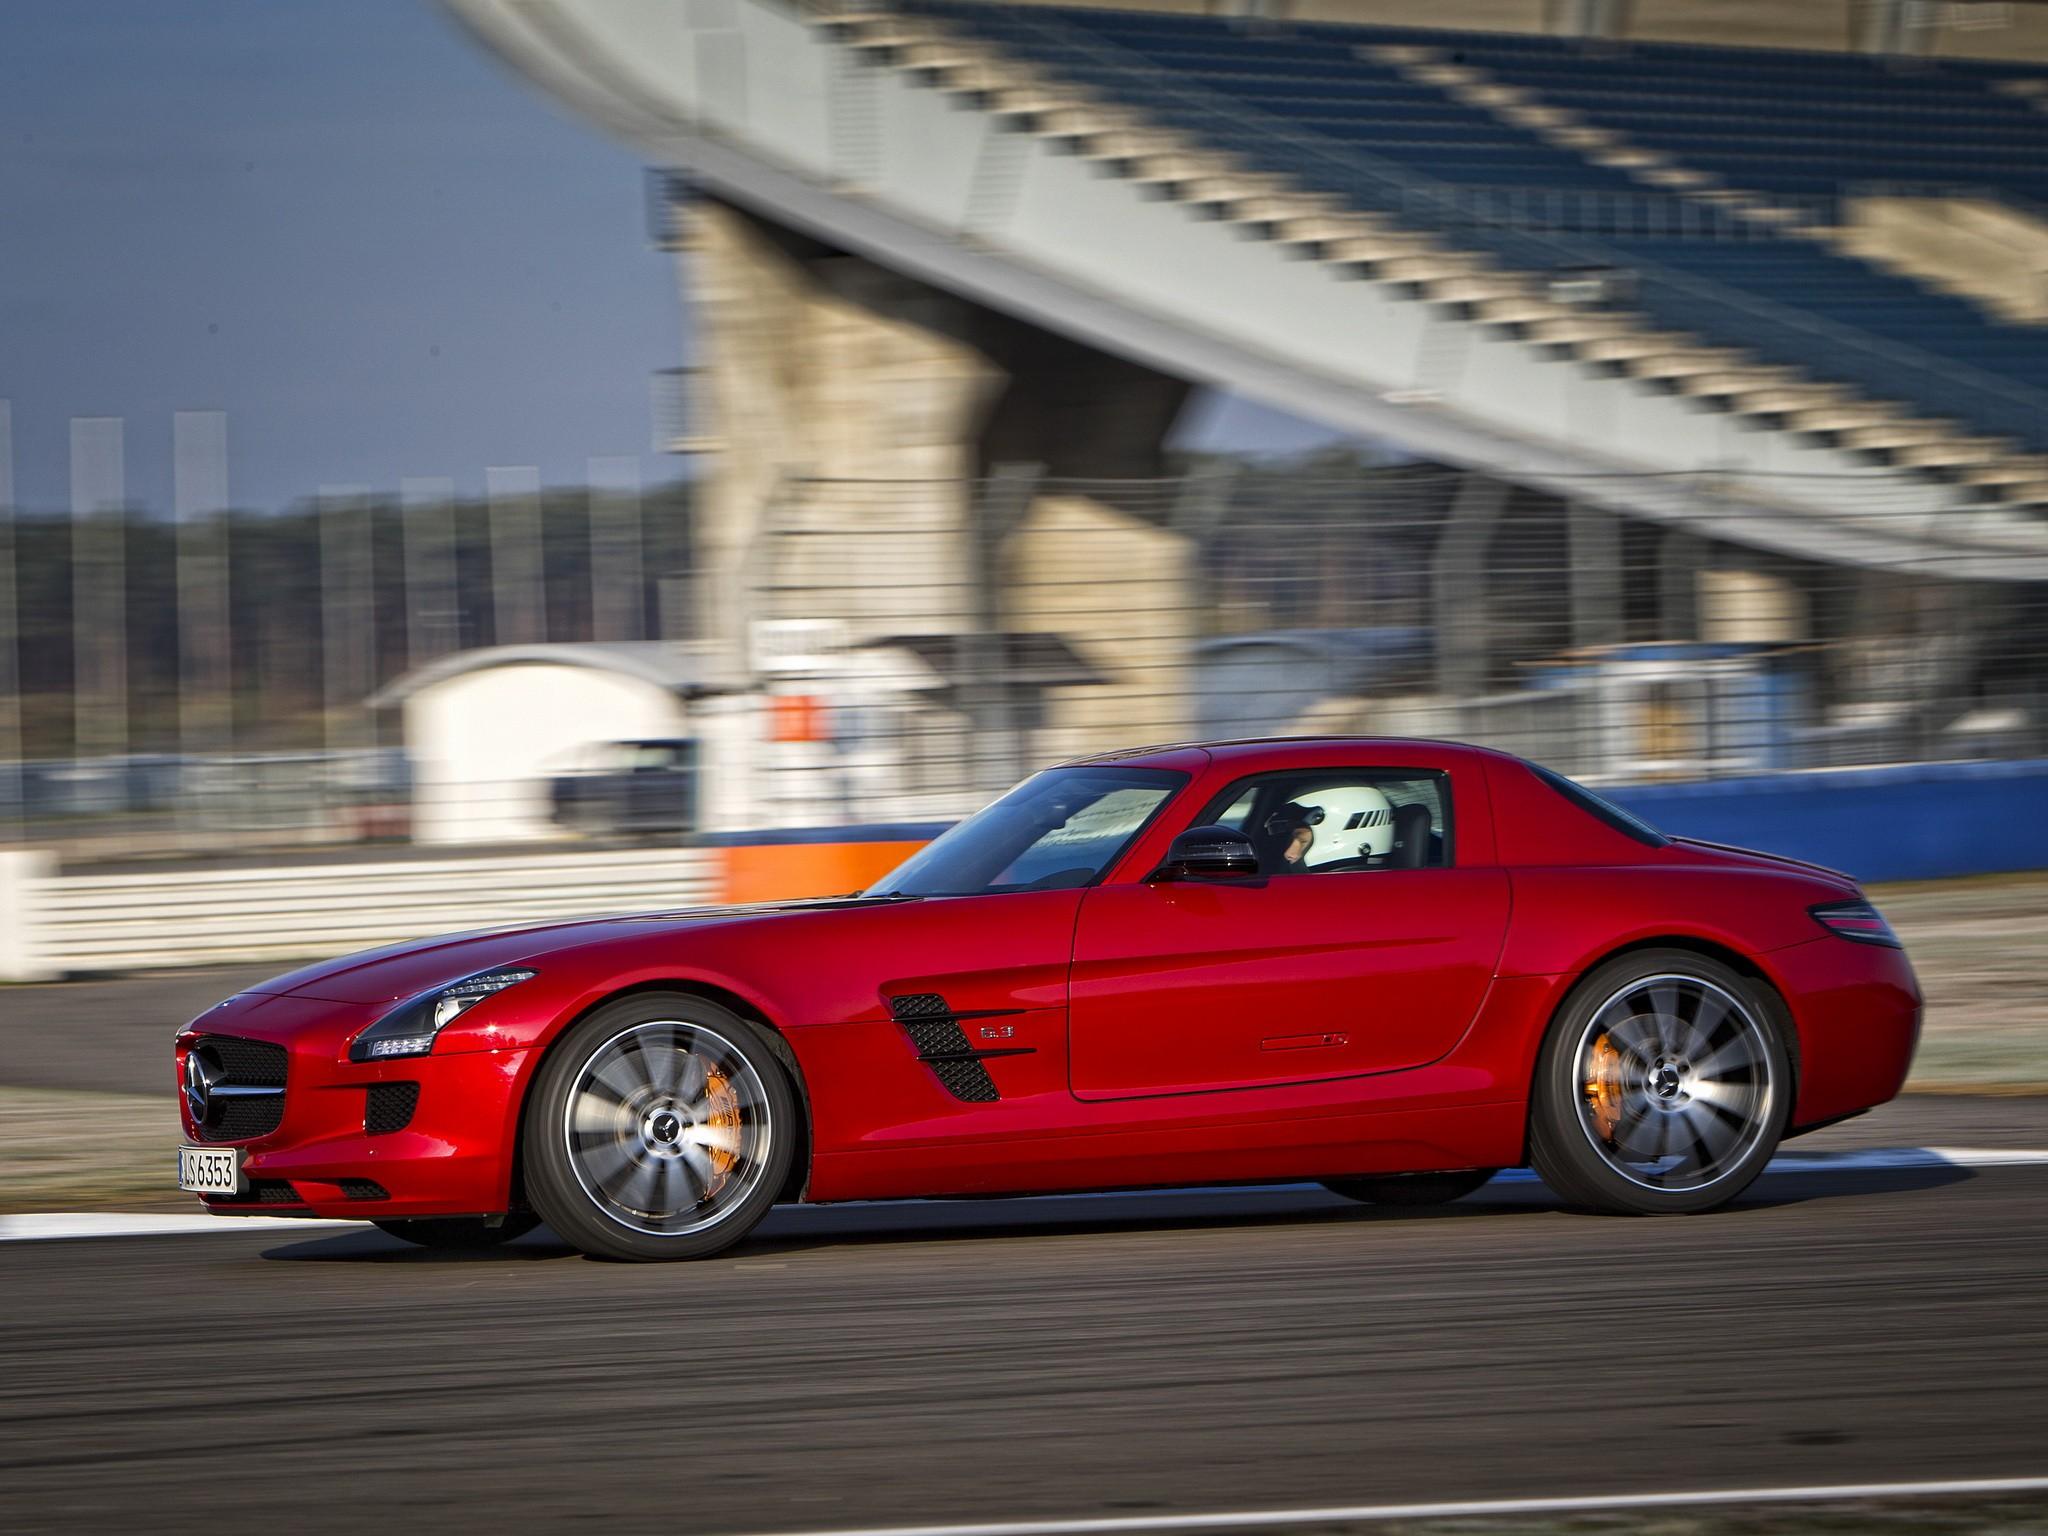 mercedes benz sls amg gt specs 2012 2013 2014 autoevolution. Cars Review. Best American Auto & Cars Review